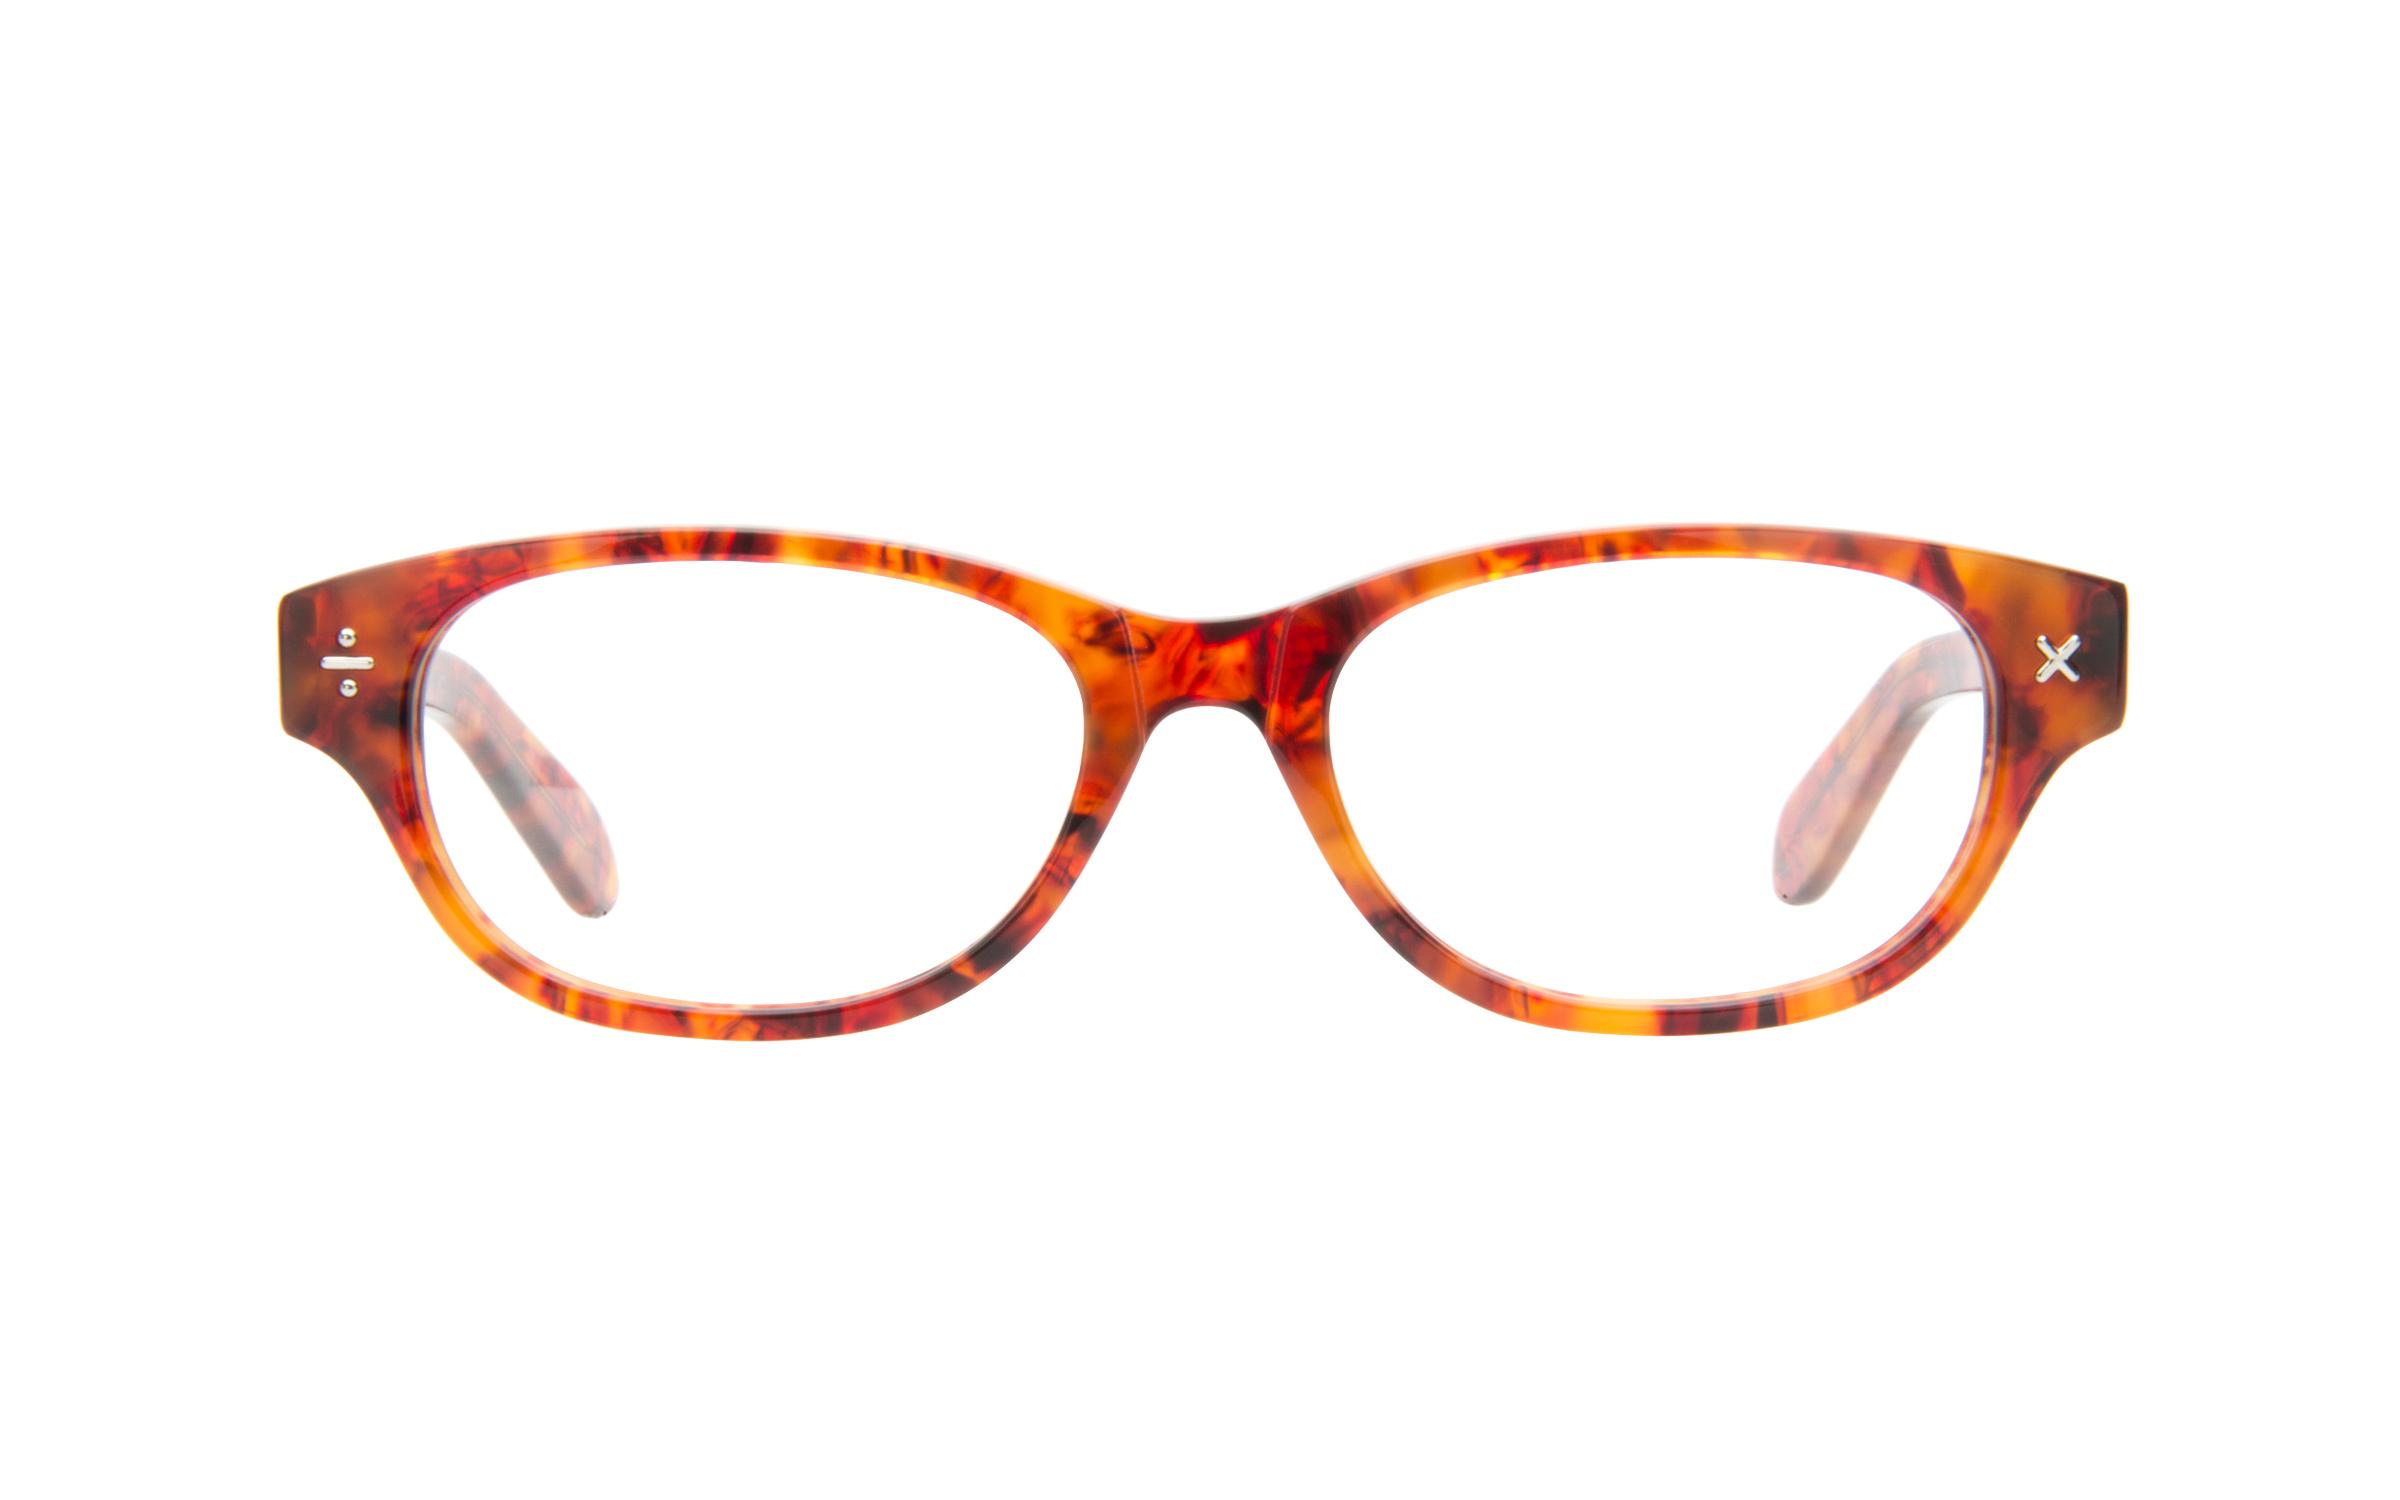 http://www.coastal.com/ - Derek Cardigan Glasses Tortoise/Clear/Beige Acetate Online Coastal